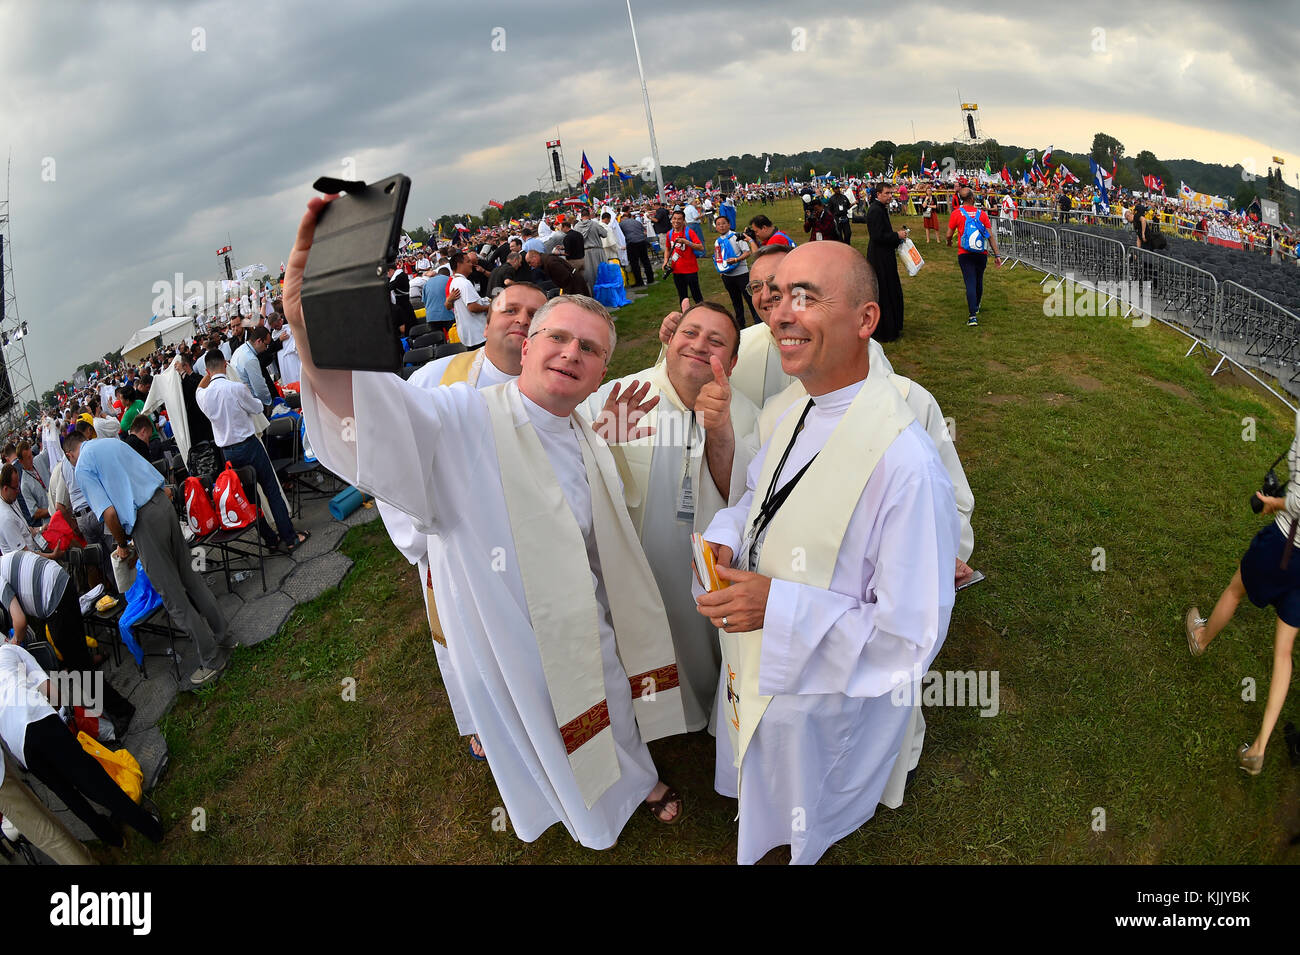 World Youth Day. Krakow. 2016. Selfie. Poland. Stock Photo